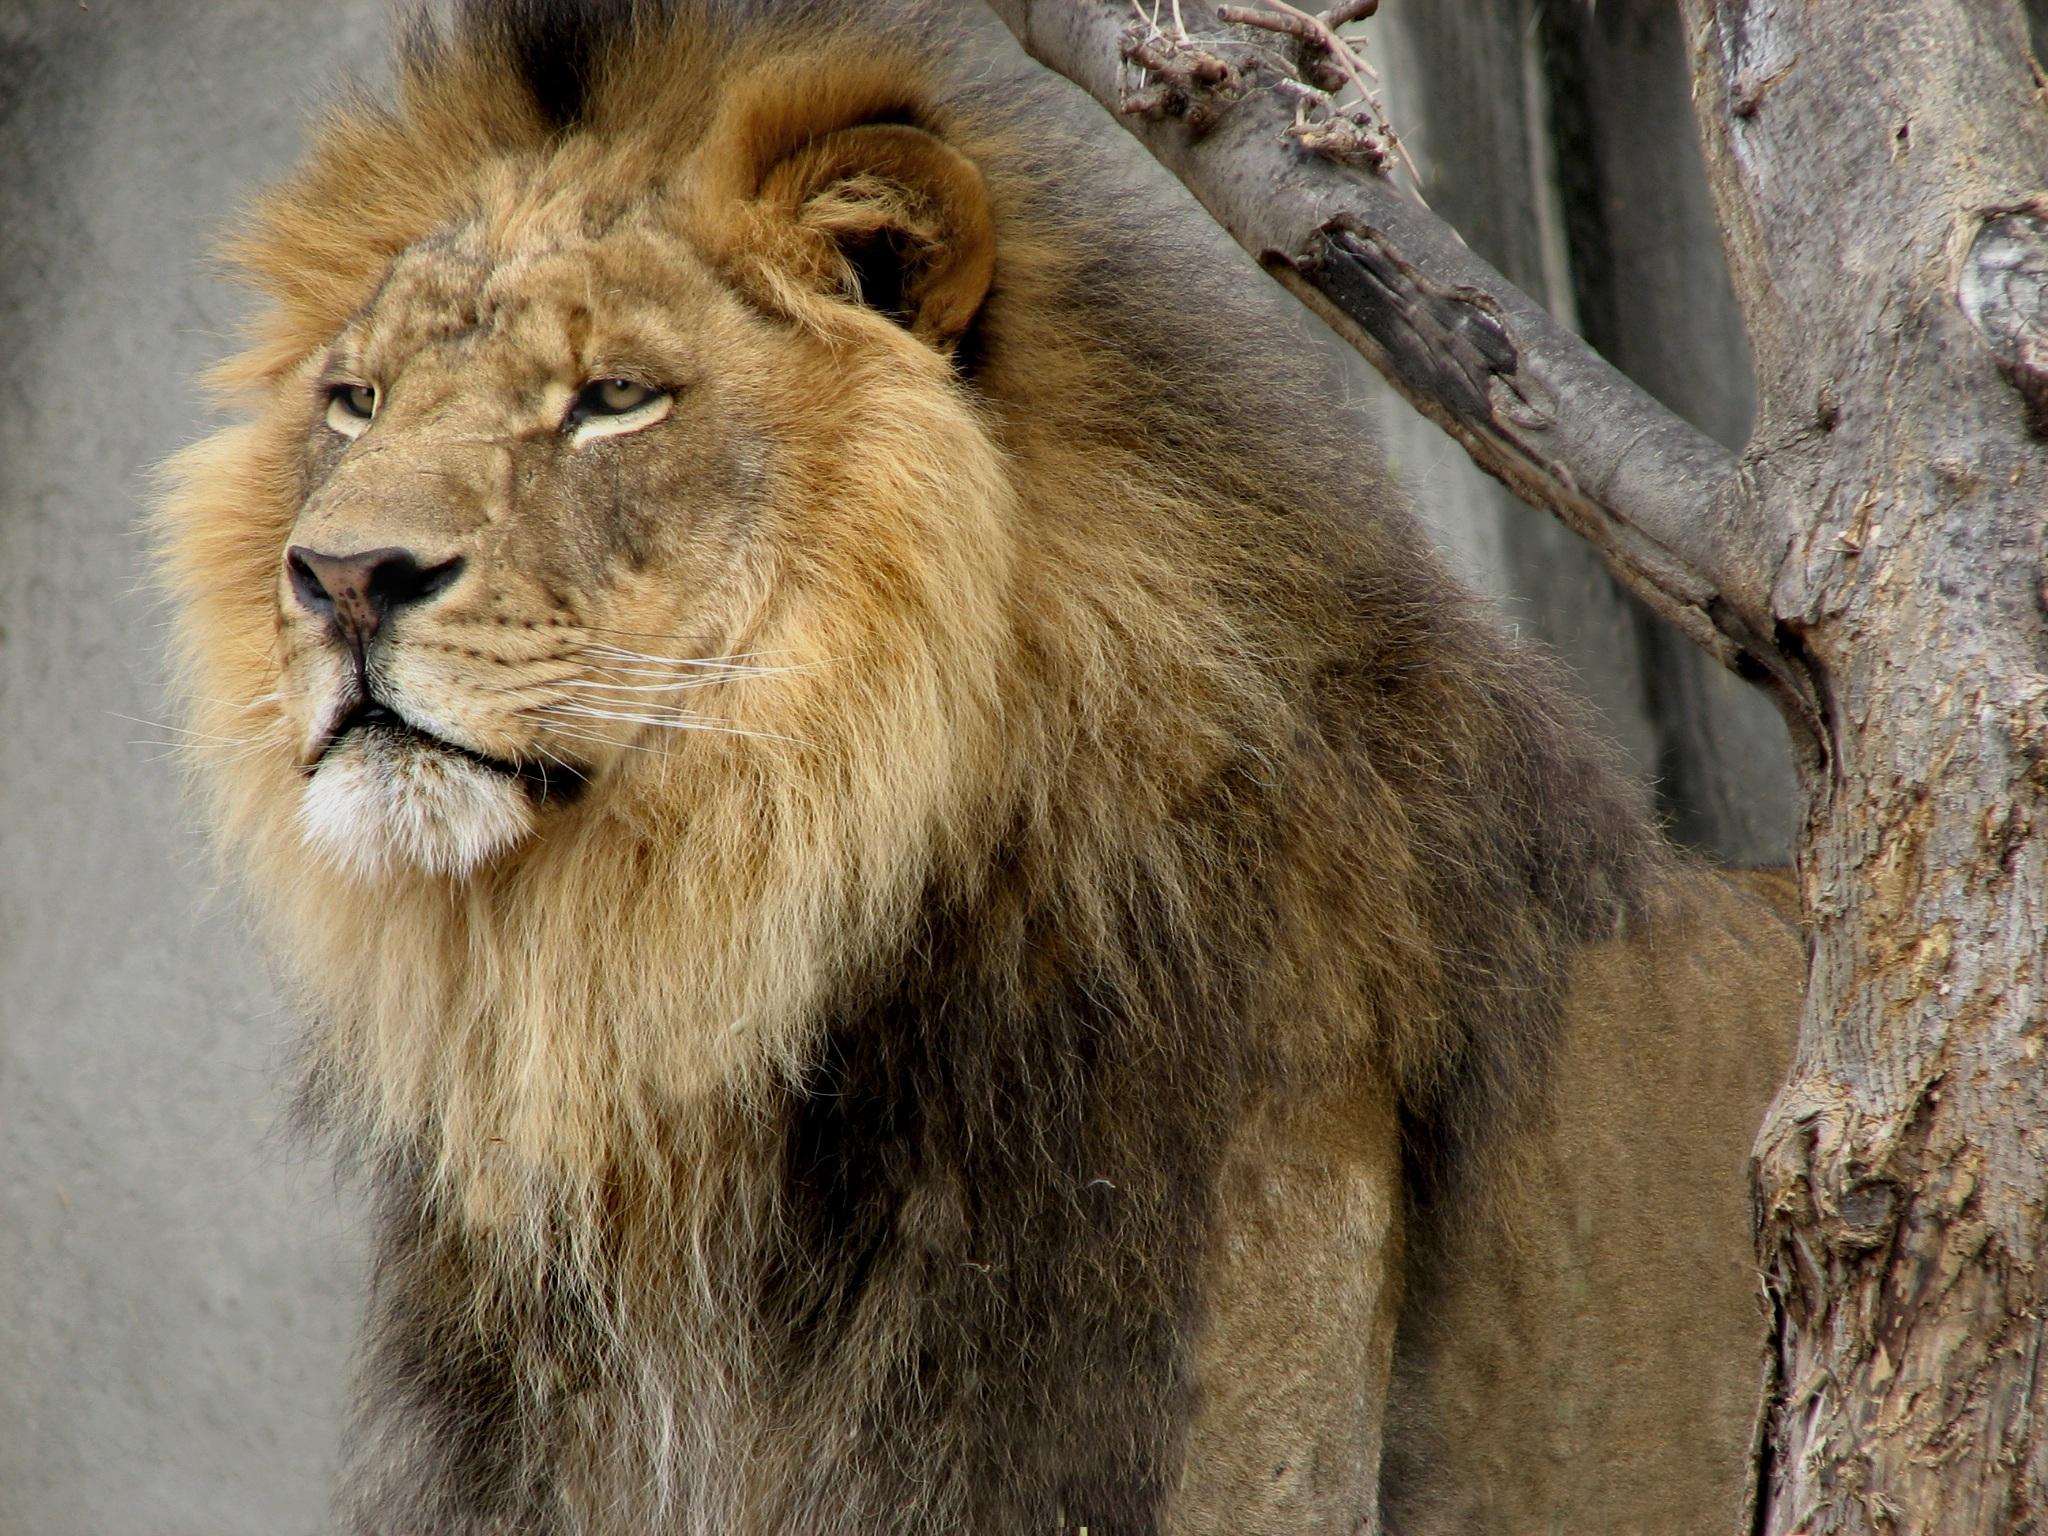 Lion with  beard photo